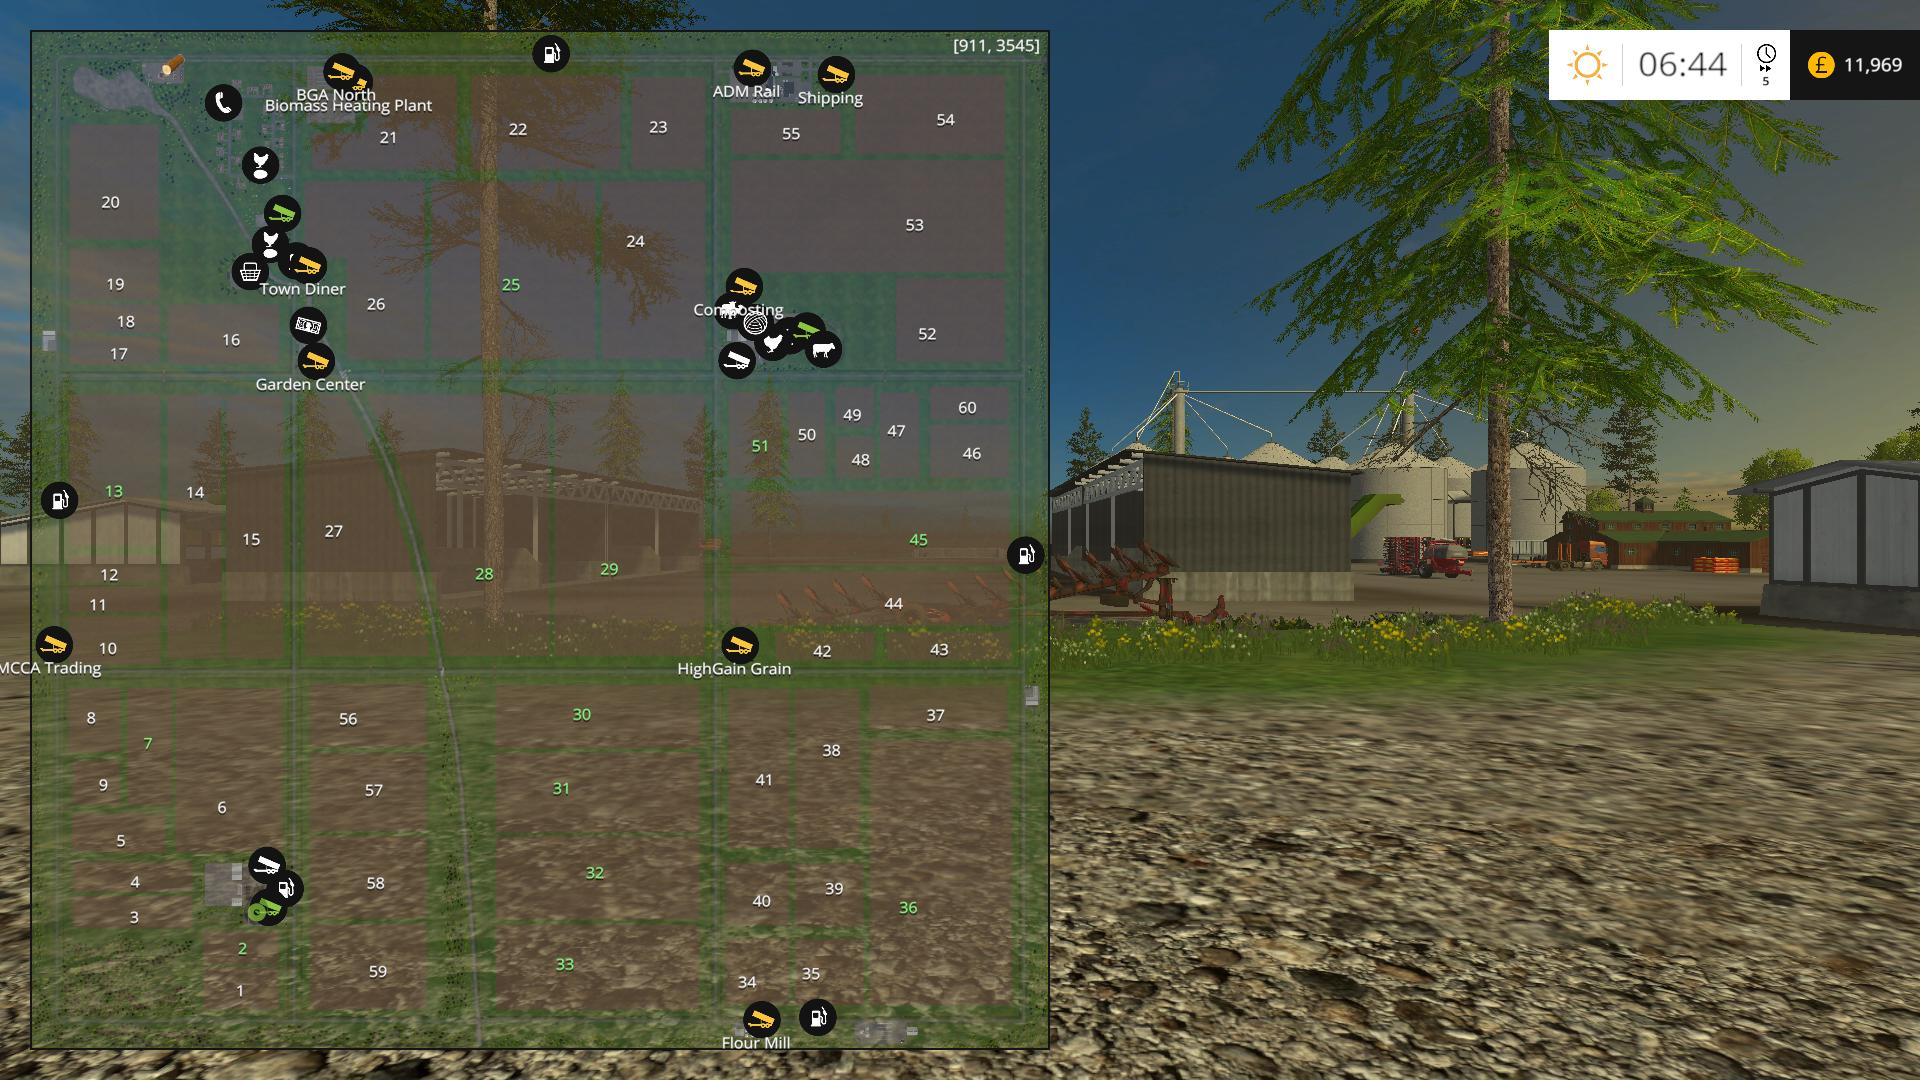 michigan-cash-crop-acres-v1-dual-maps-by-stevie-v1-dual-maps_3